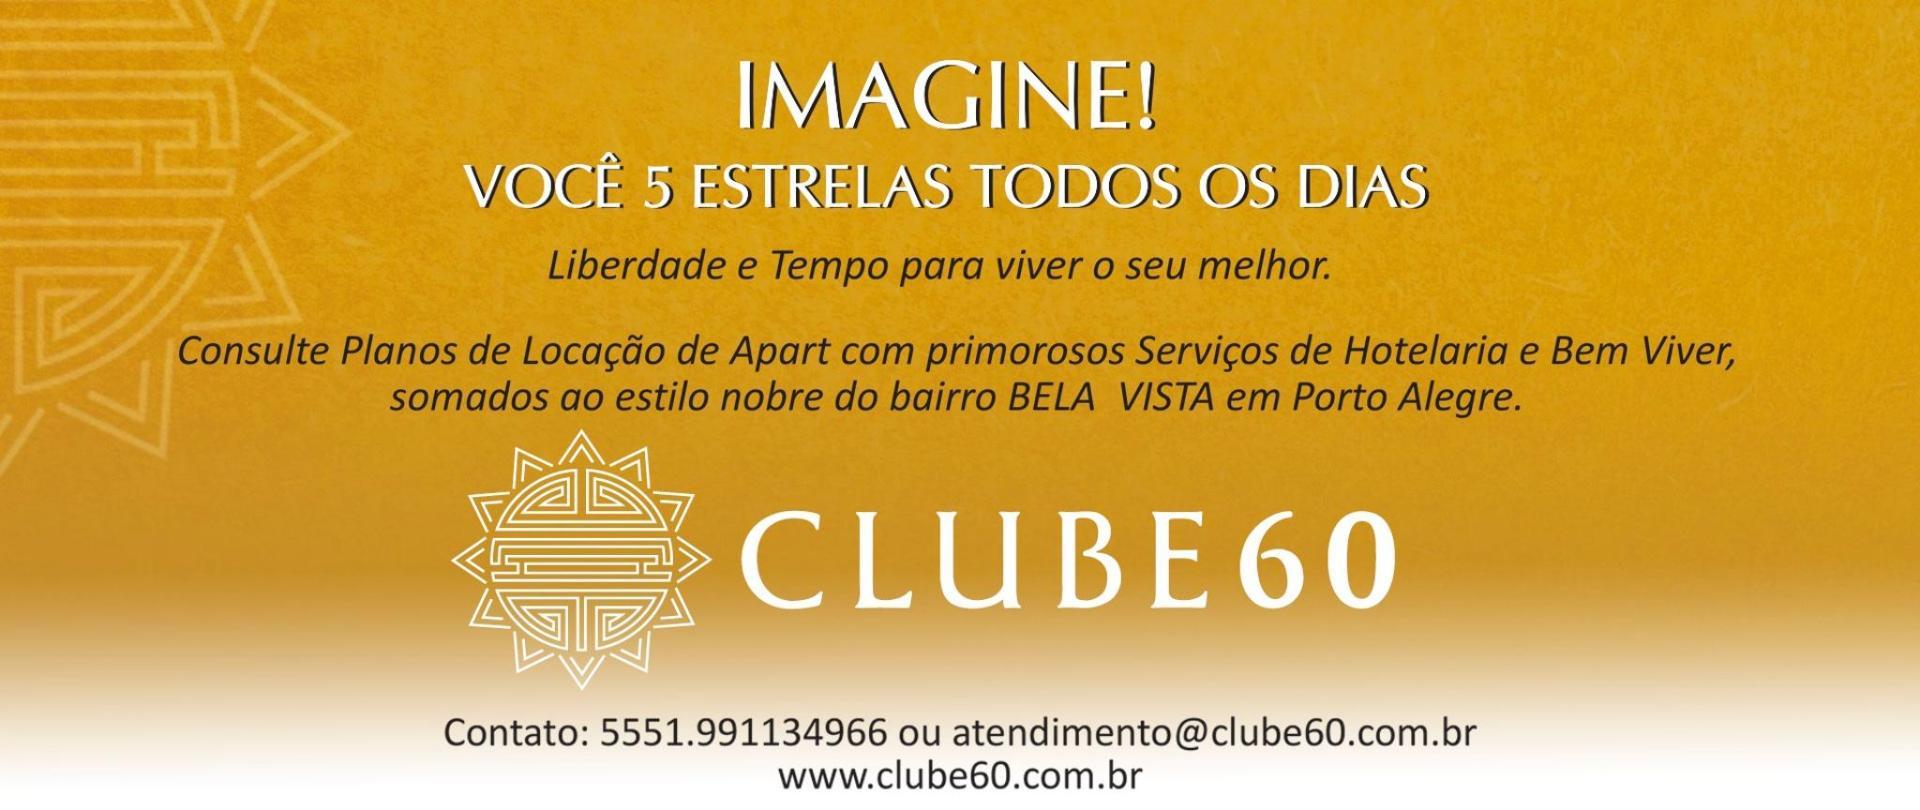 CLUBE 60_ 1920X810_FLYER SITE (2).jpg